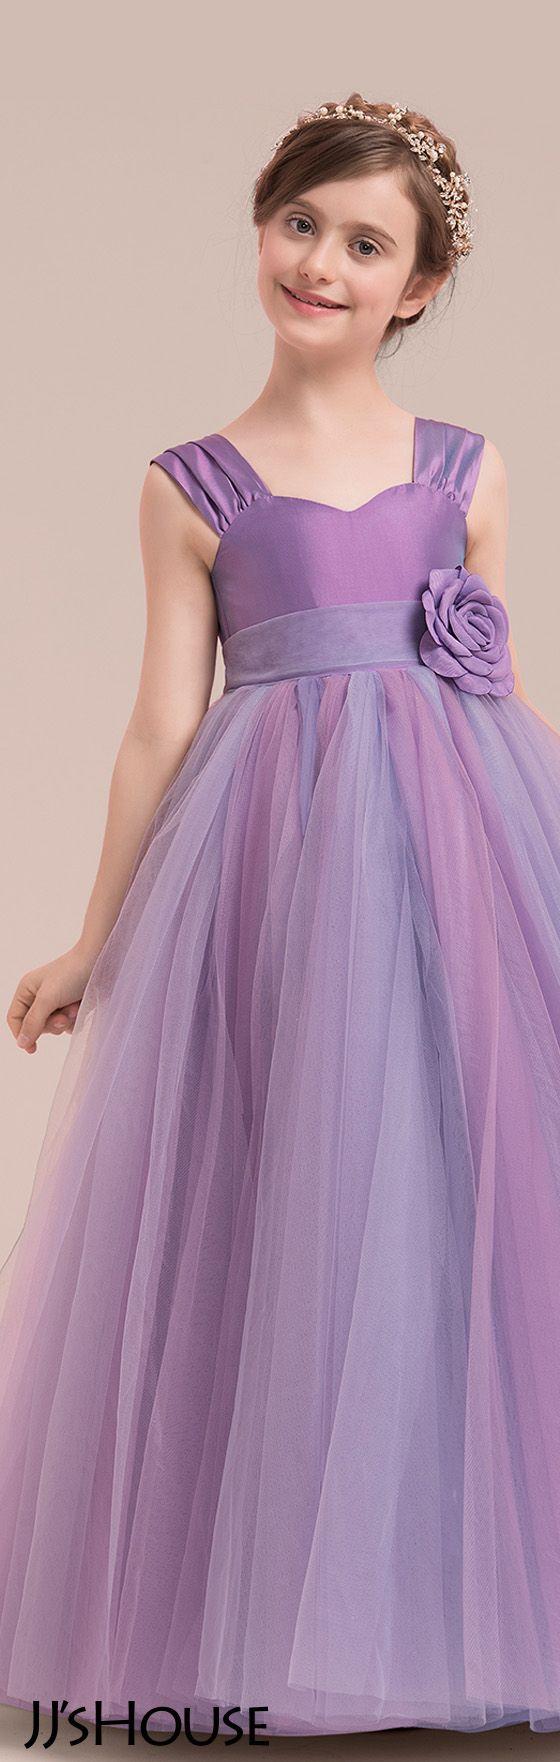 FlowerGirl #JJsHouse | ropa niños | Pinterest | Vestidos de fiesta ...